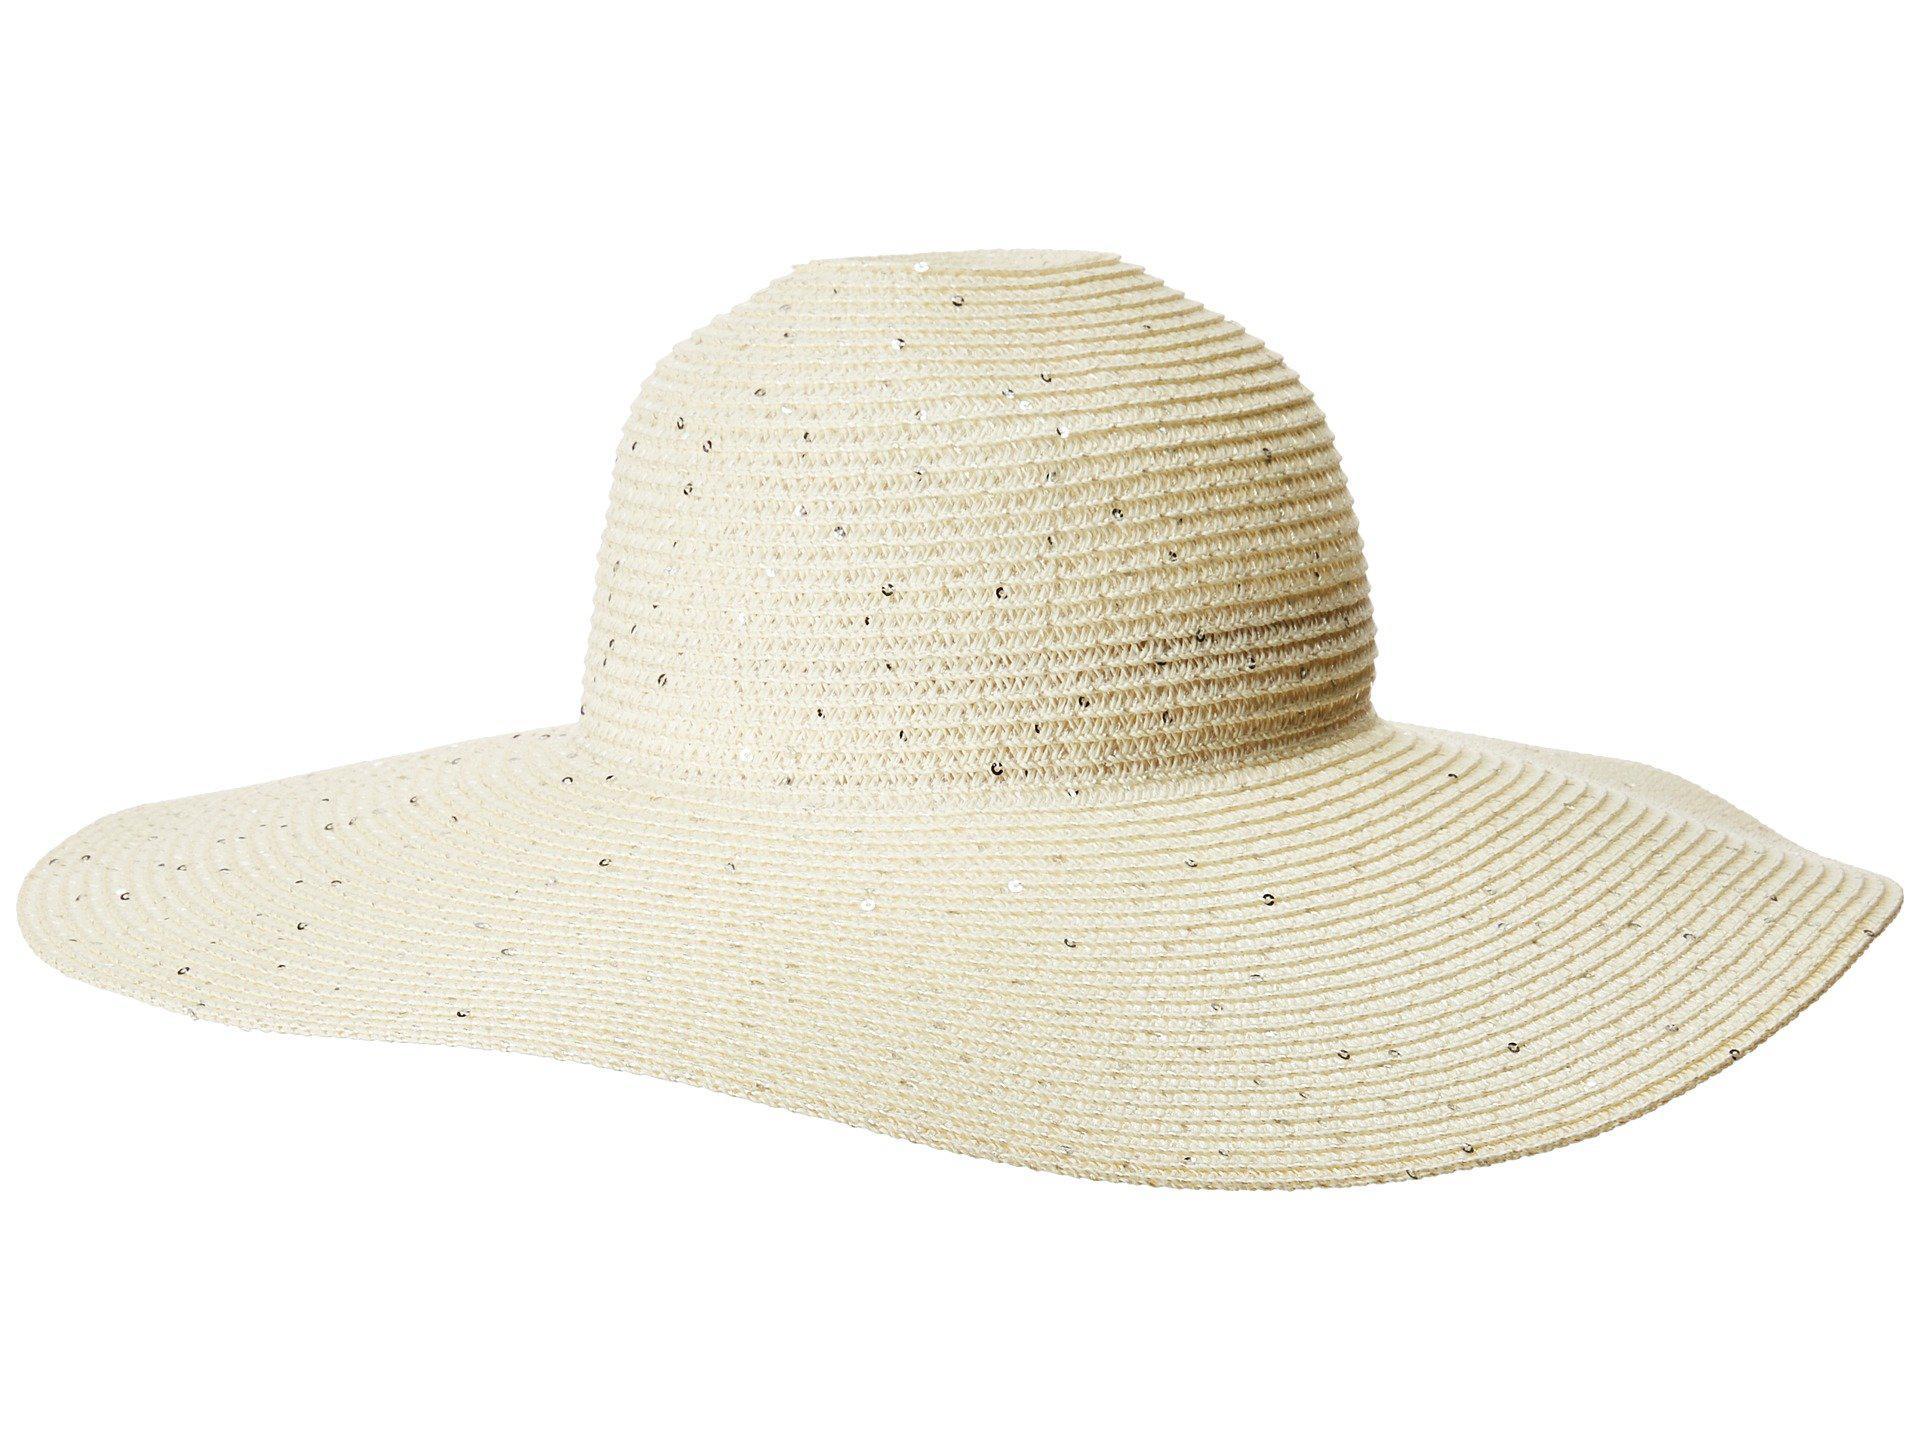 b7617090ea8 Lyst - Calvin Klein Sequin Straw Sunhat (ivory) Caps in White